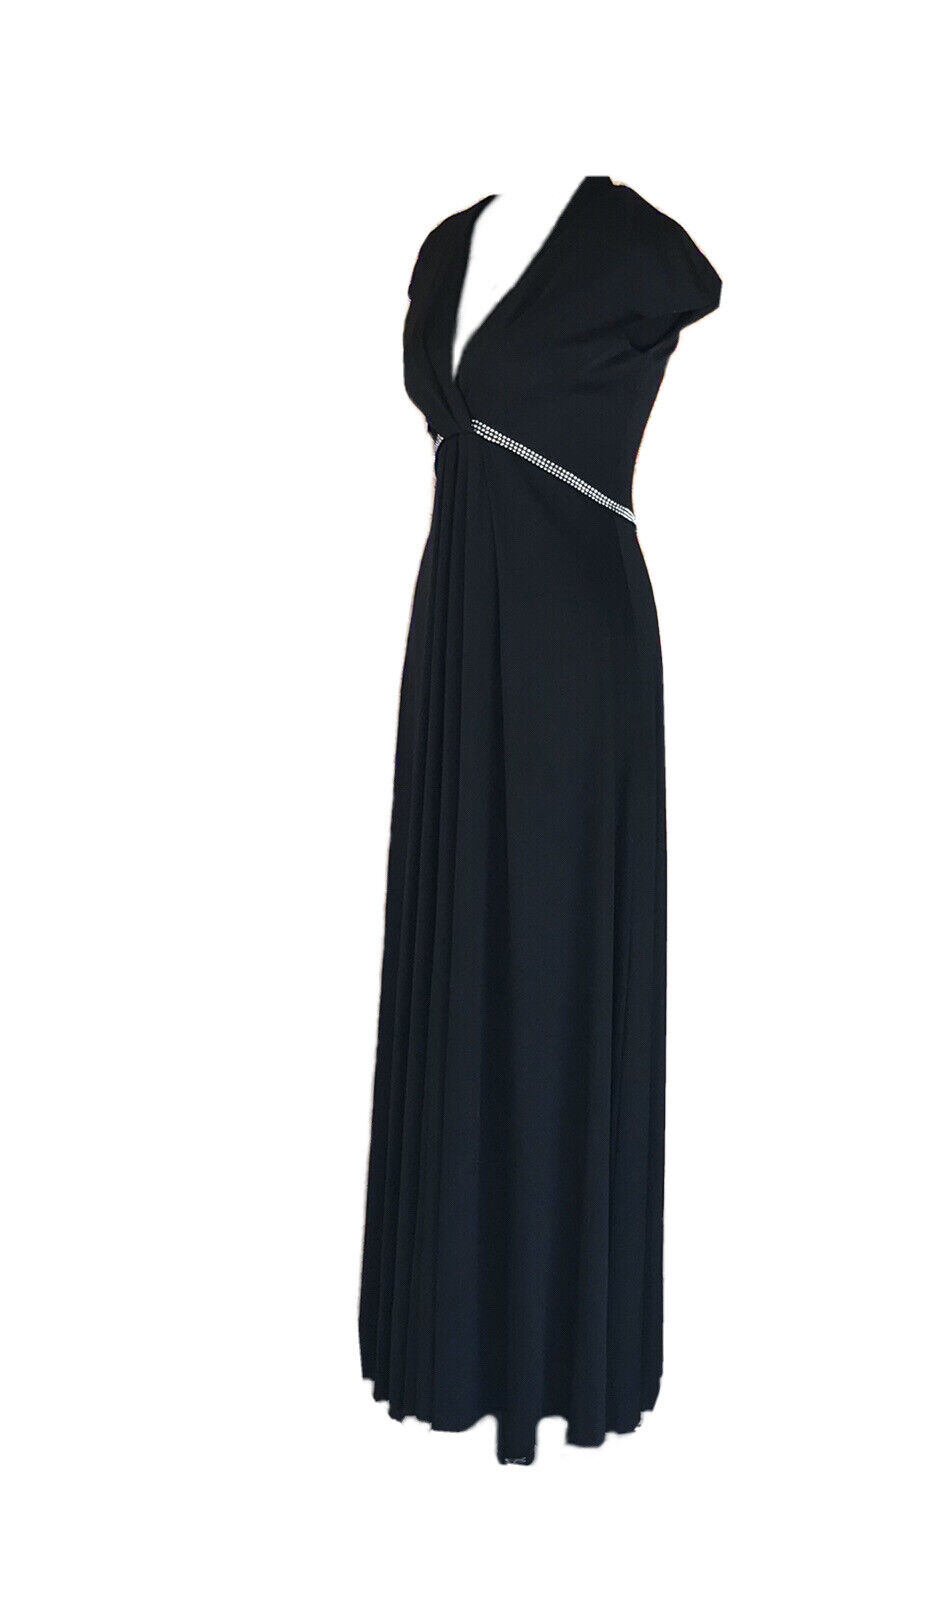 Vintage Luis Estevez Dress Eva Gabor Look Label B… - image 8